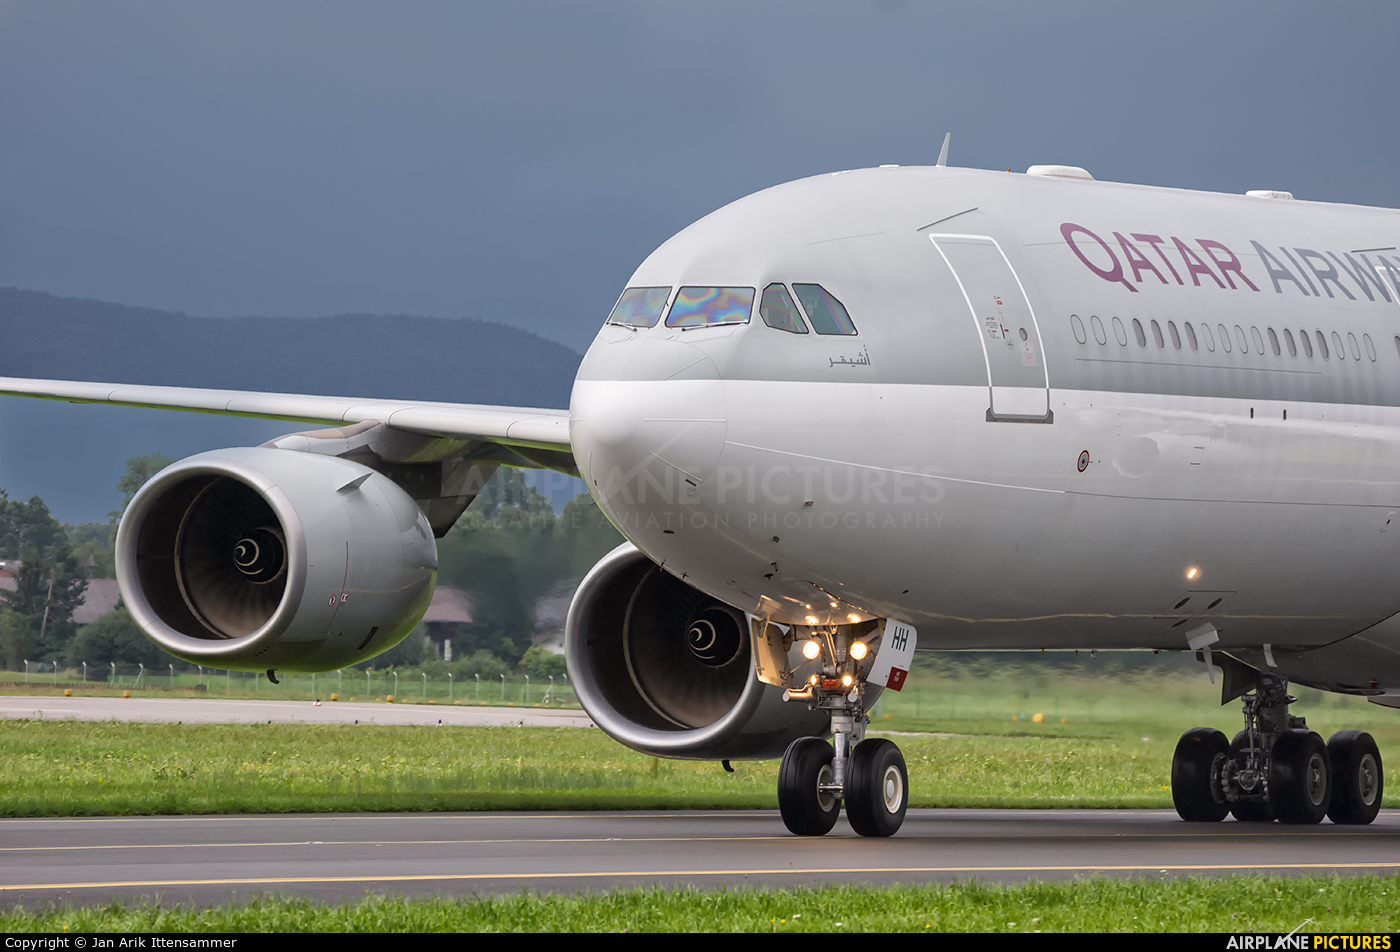 Qatar Amiri Flight A7-HHH aircraft at Salzburg